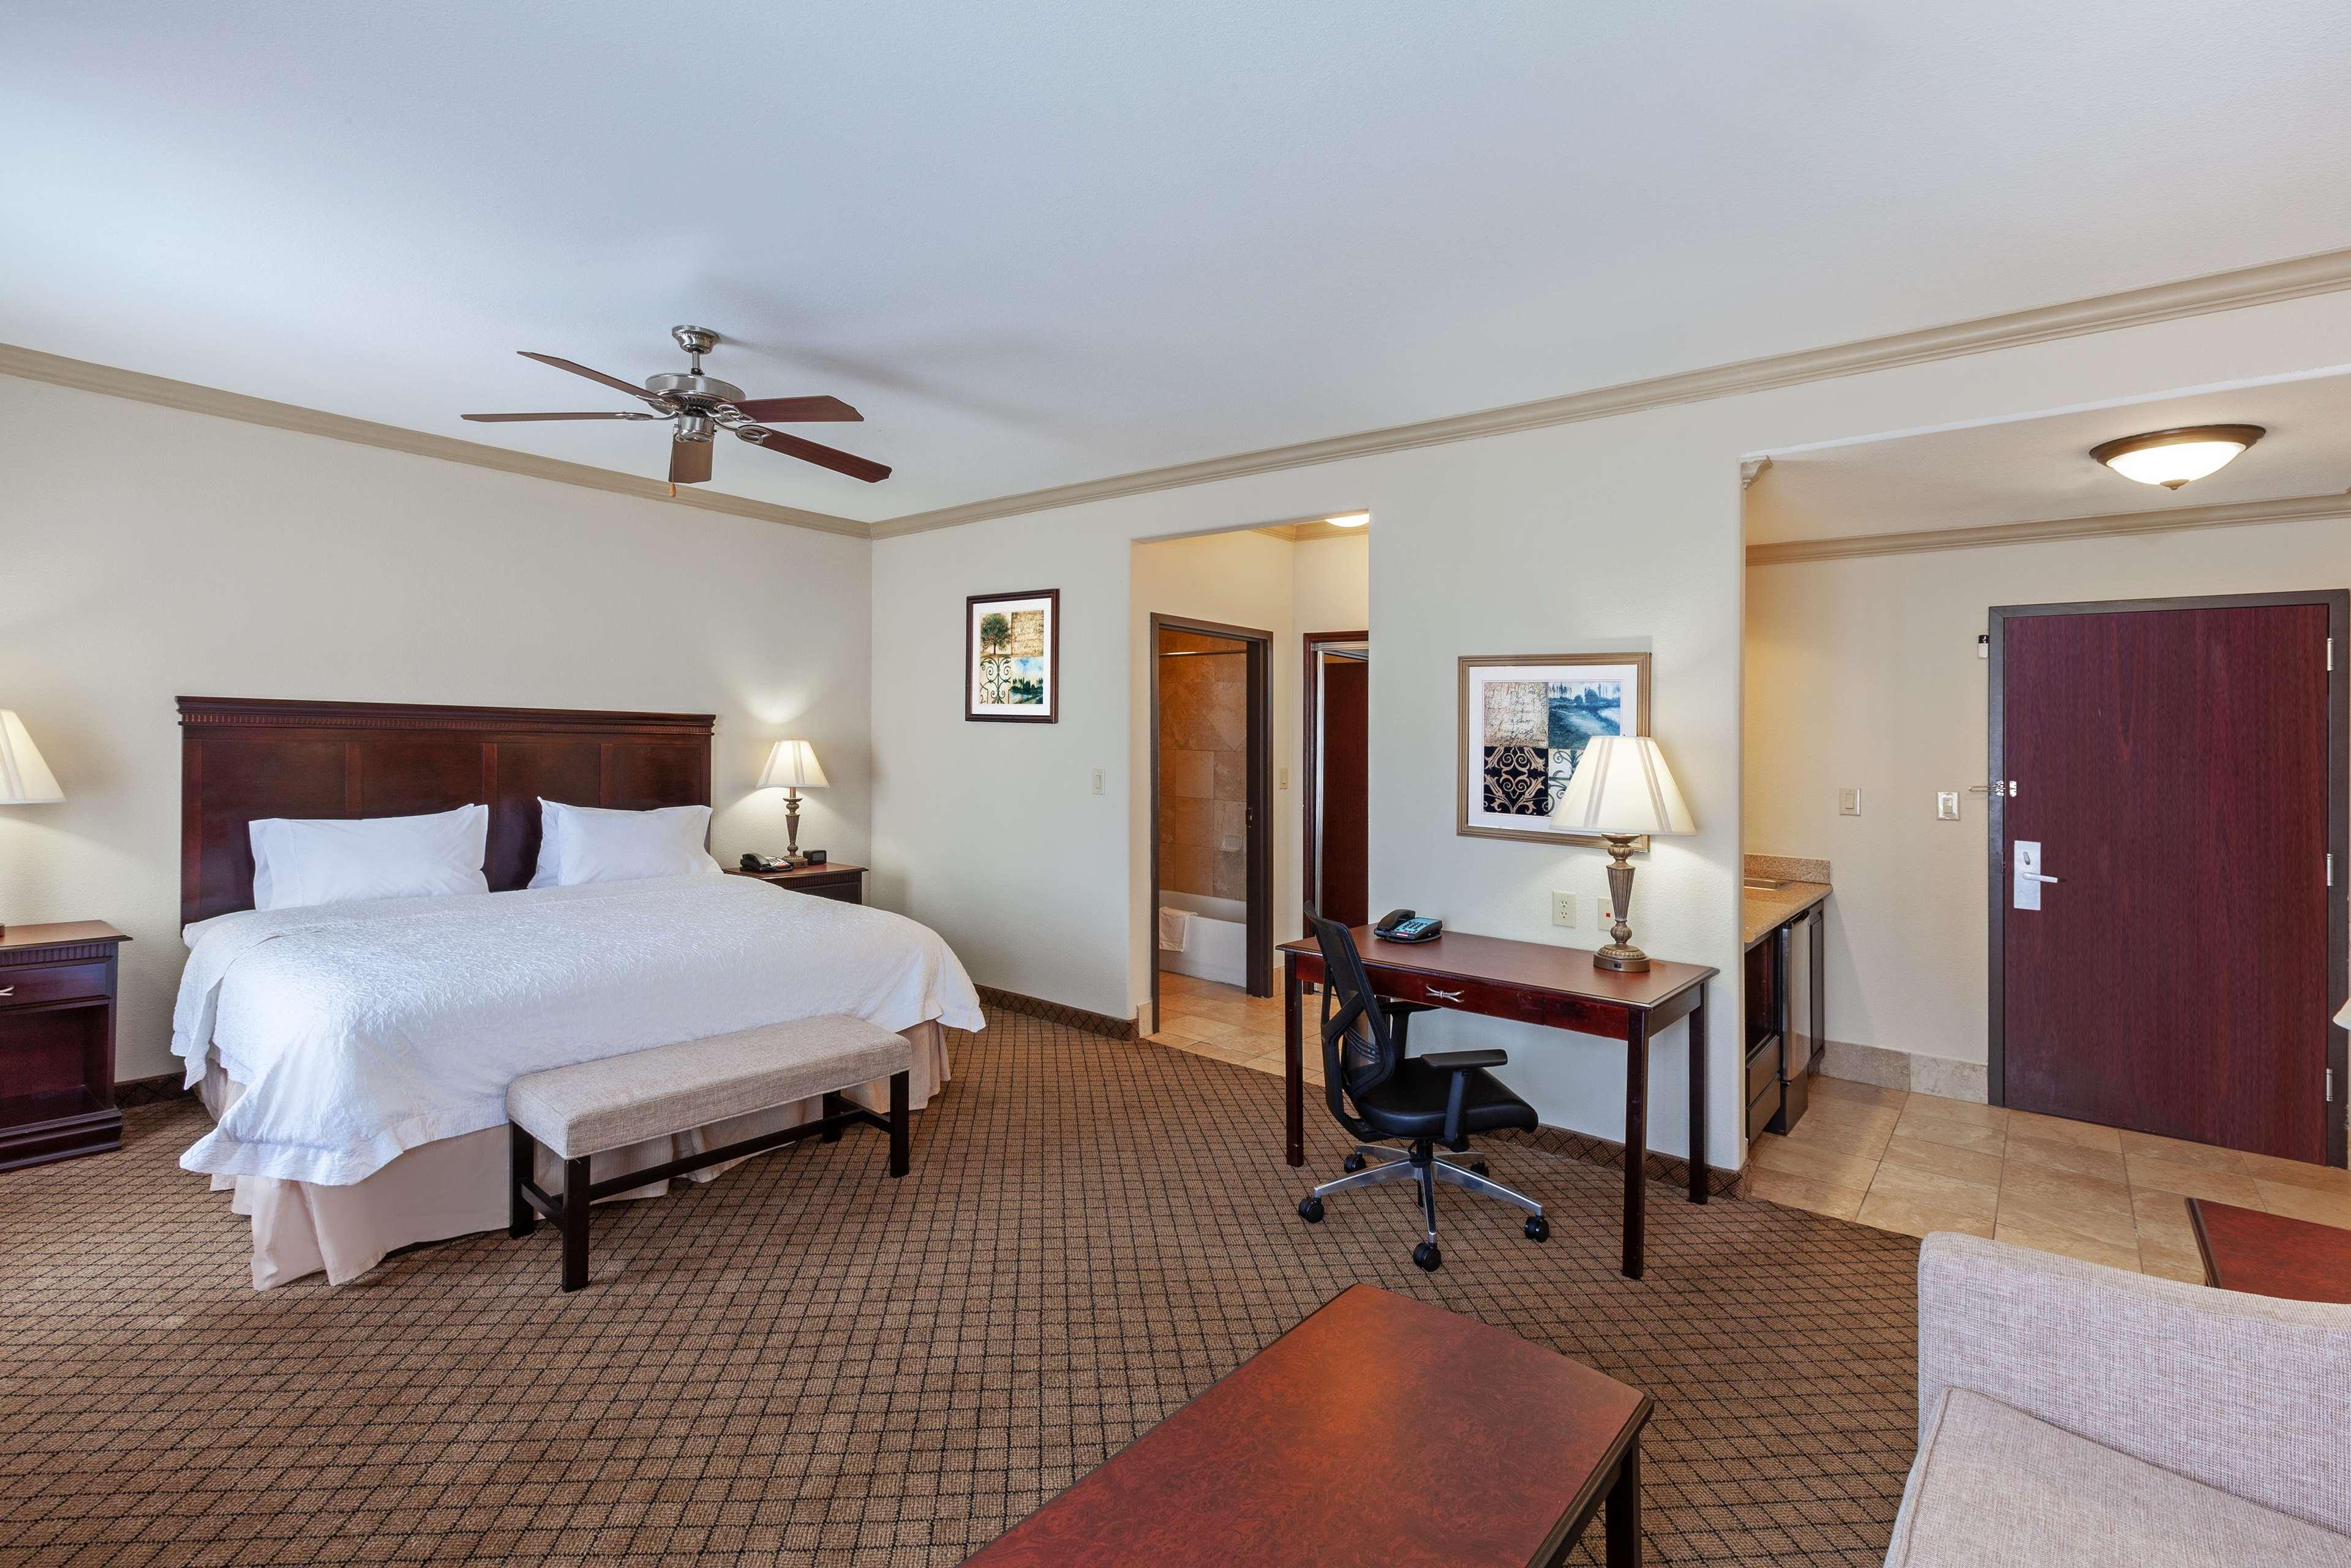 Hampton Inn & Suites Galveston image 27